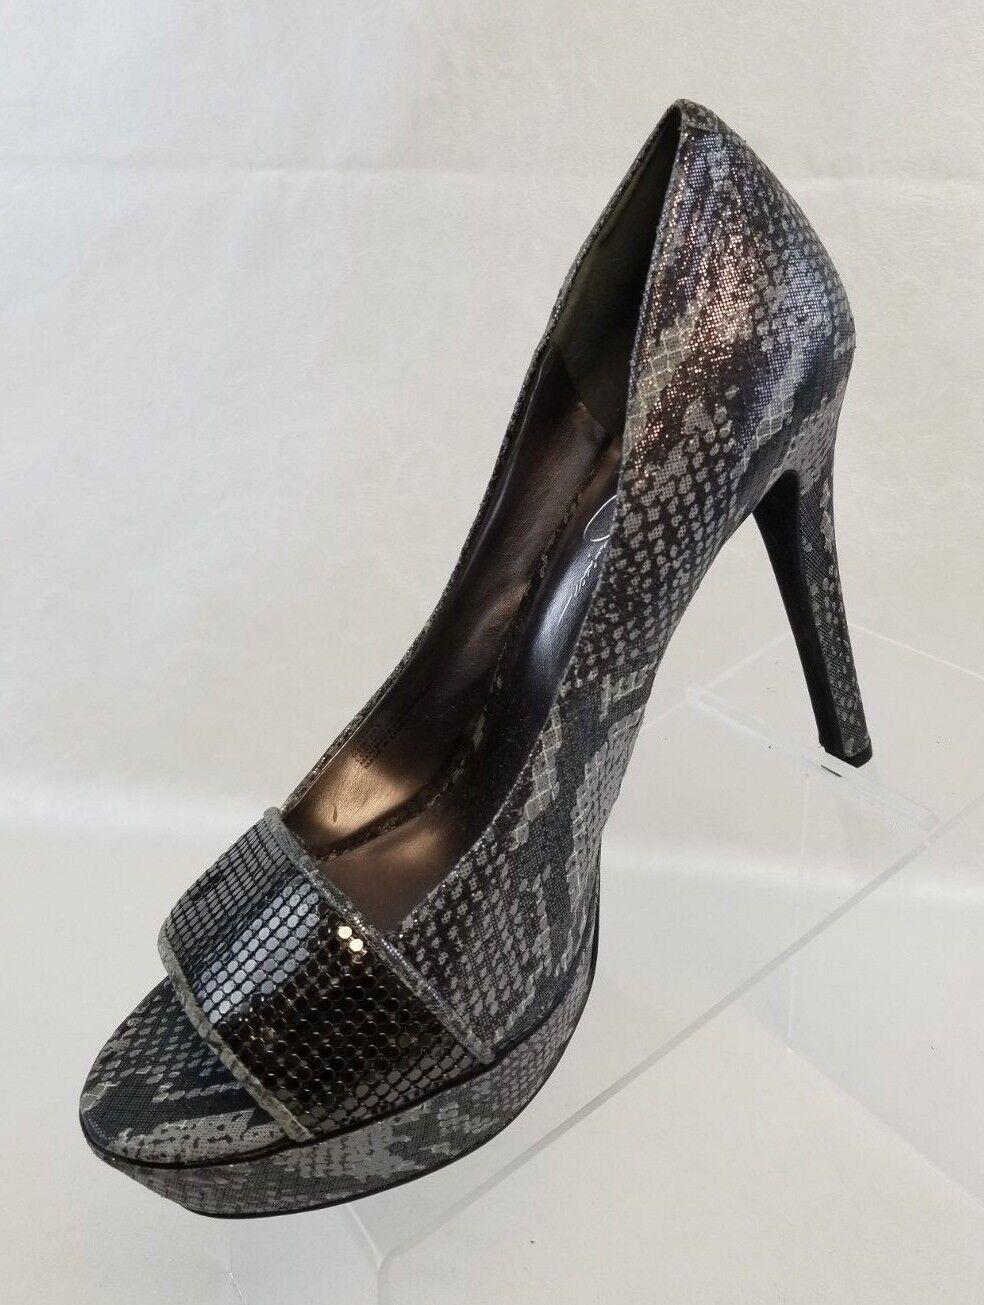 Jessica Simpson Terri Platform Stilettos Damenschuhe Schuhes Pewter Print Slip On Schuhes Damenschuhe 9.5B 2c7219